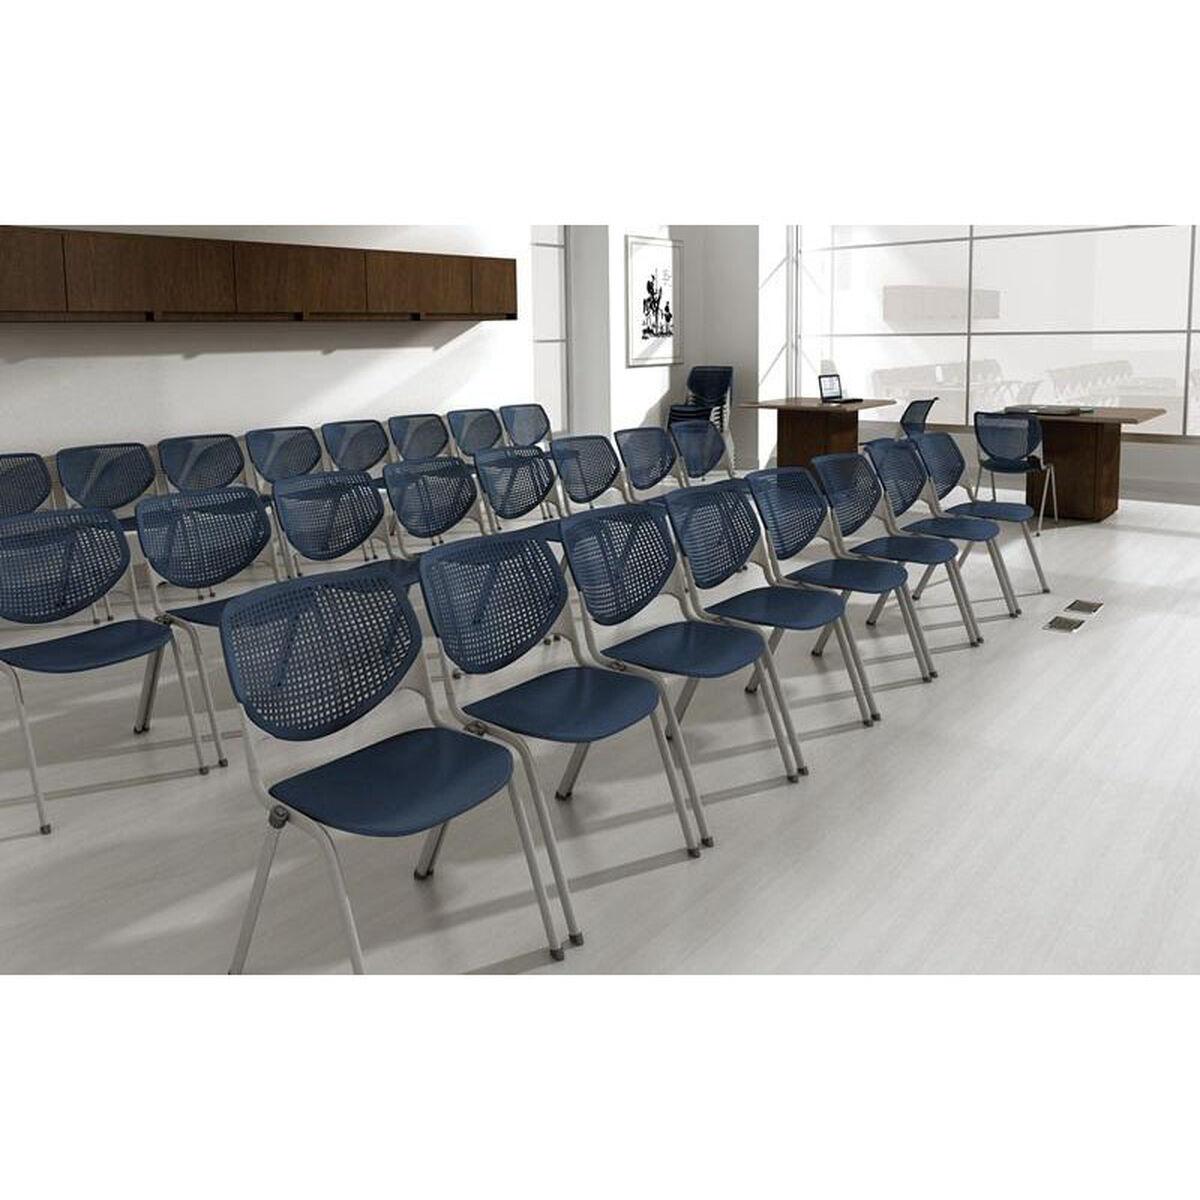 vtg 1940 50s simmons furniture metal medical. Kool Furniture. Images Furniture Vtg 1940 50s Simmons Metal Medical